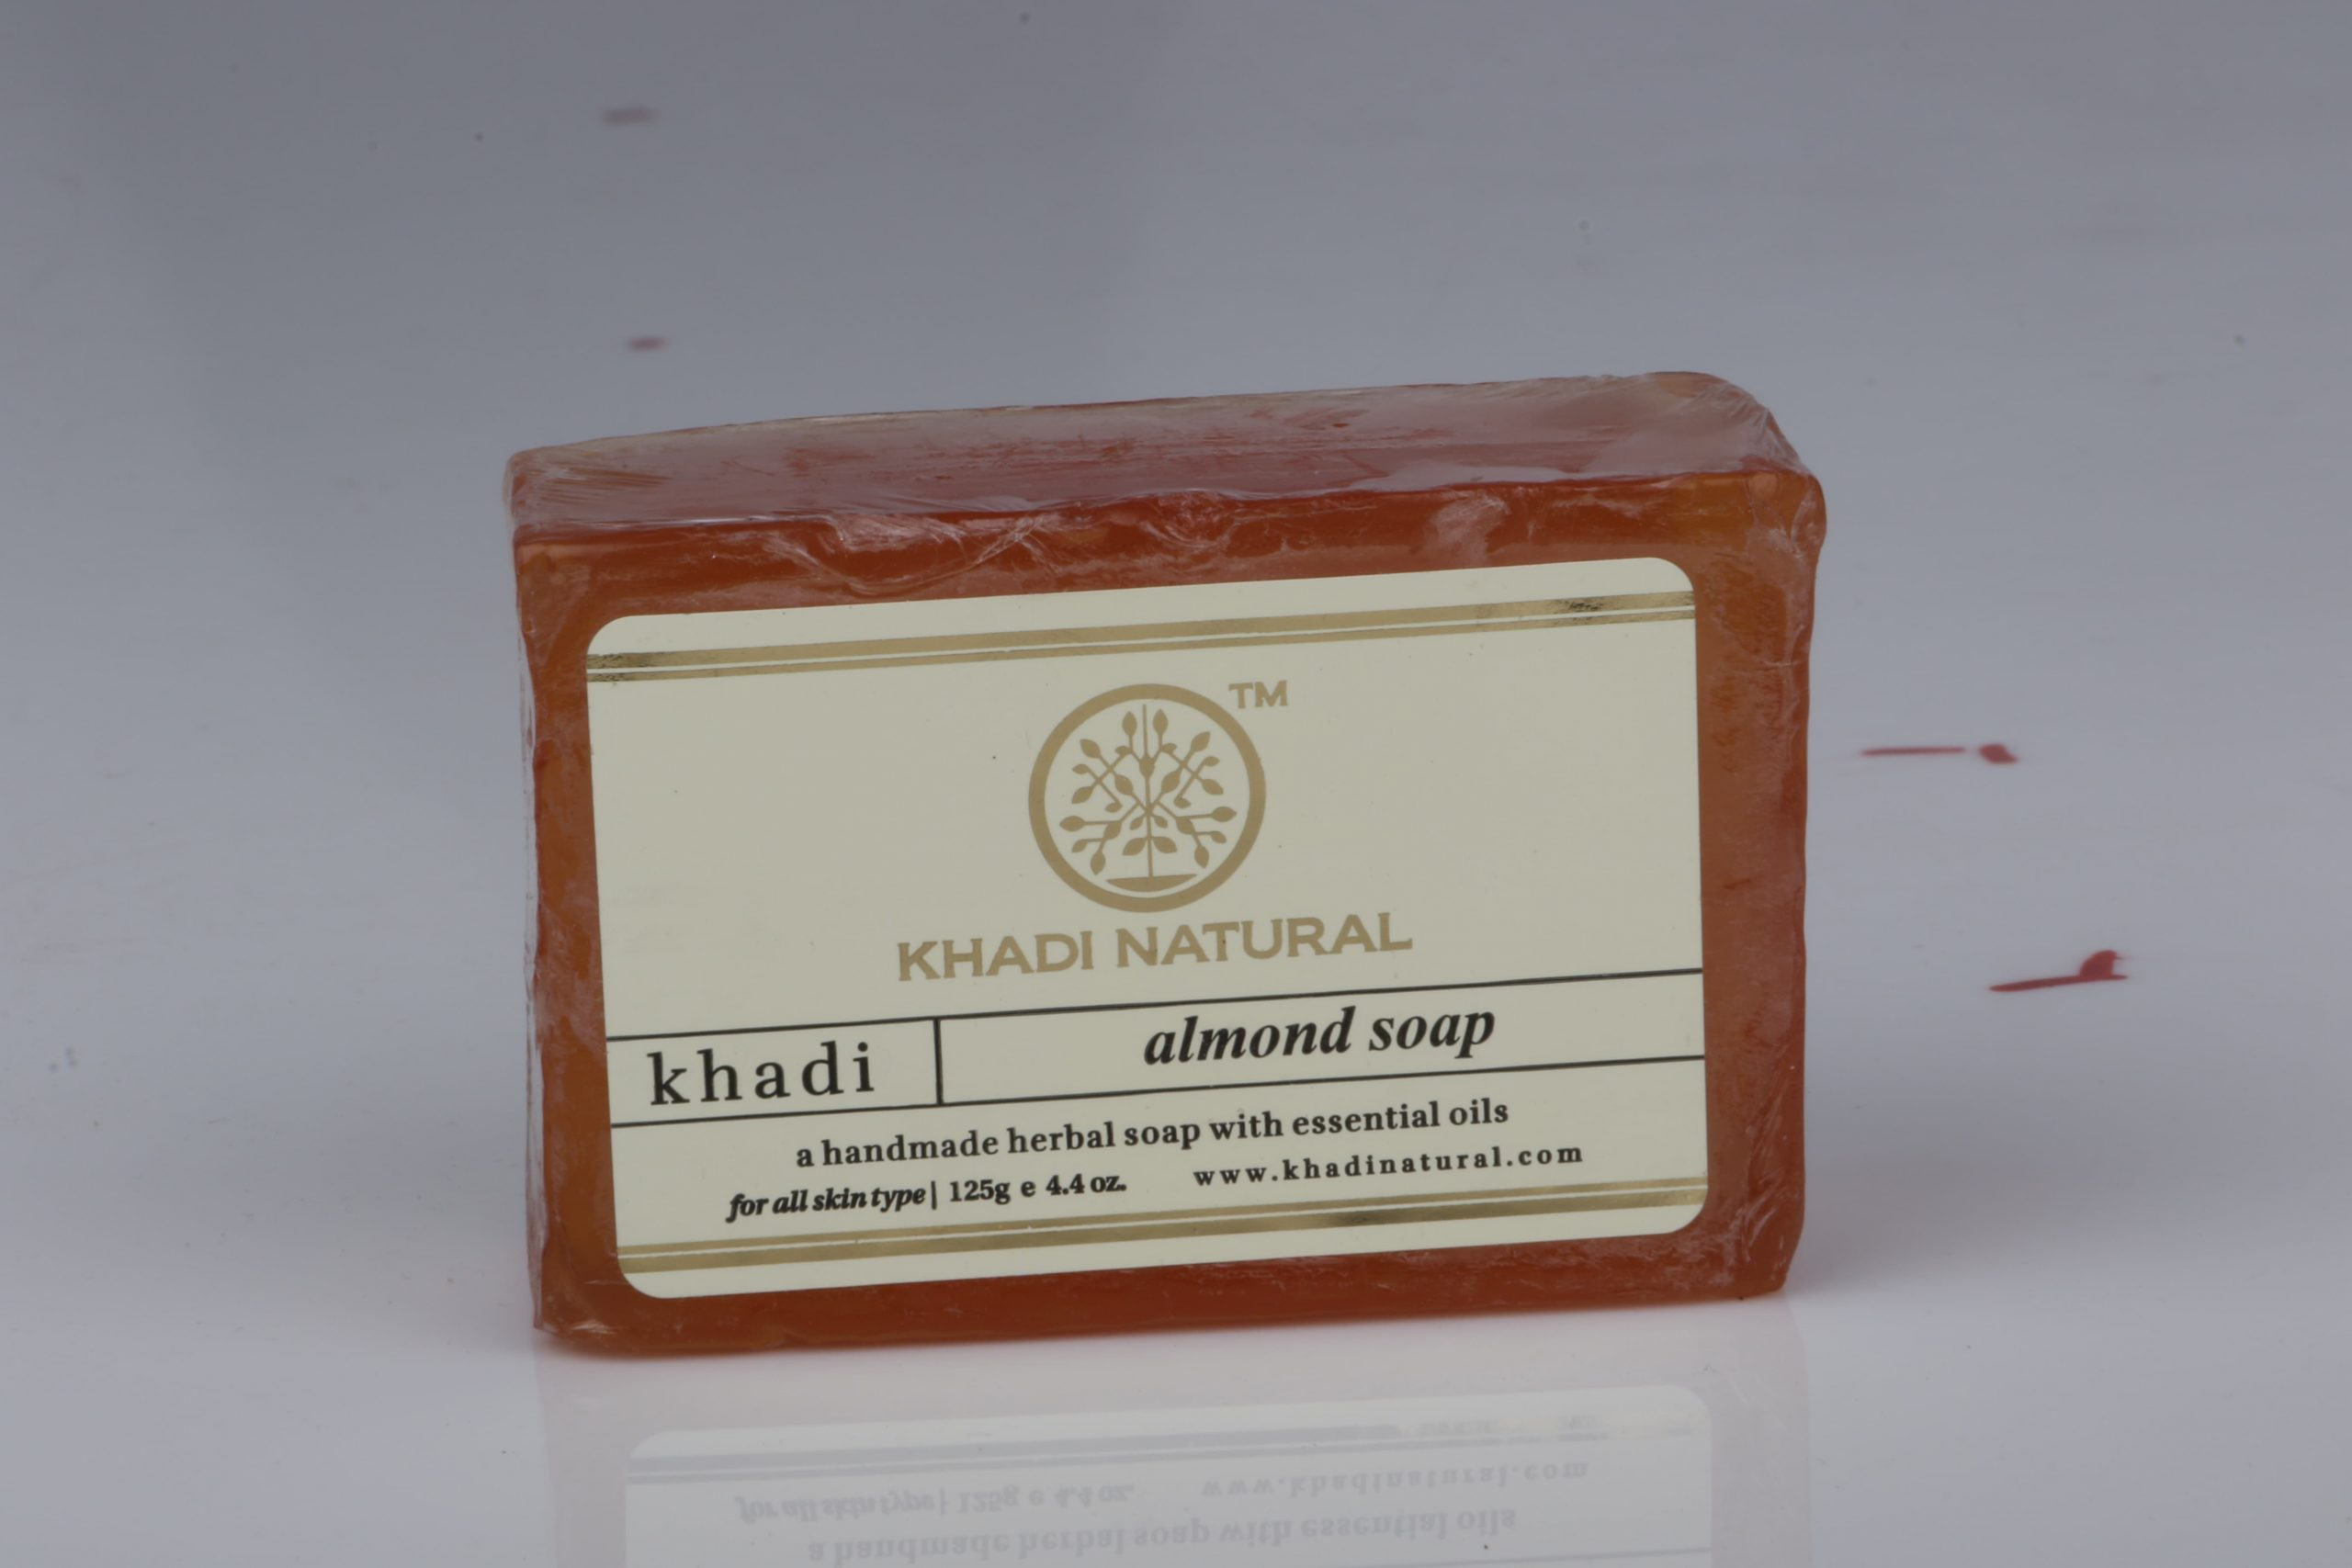 KHADI NATURAL ALMOND SOAP 125GM